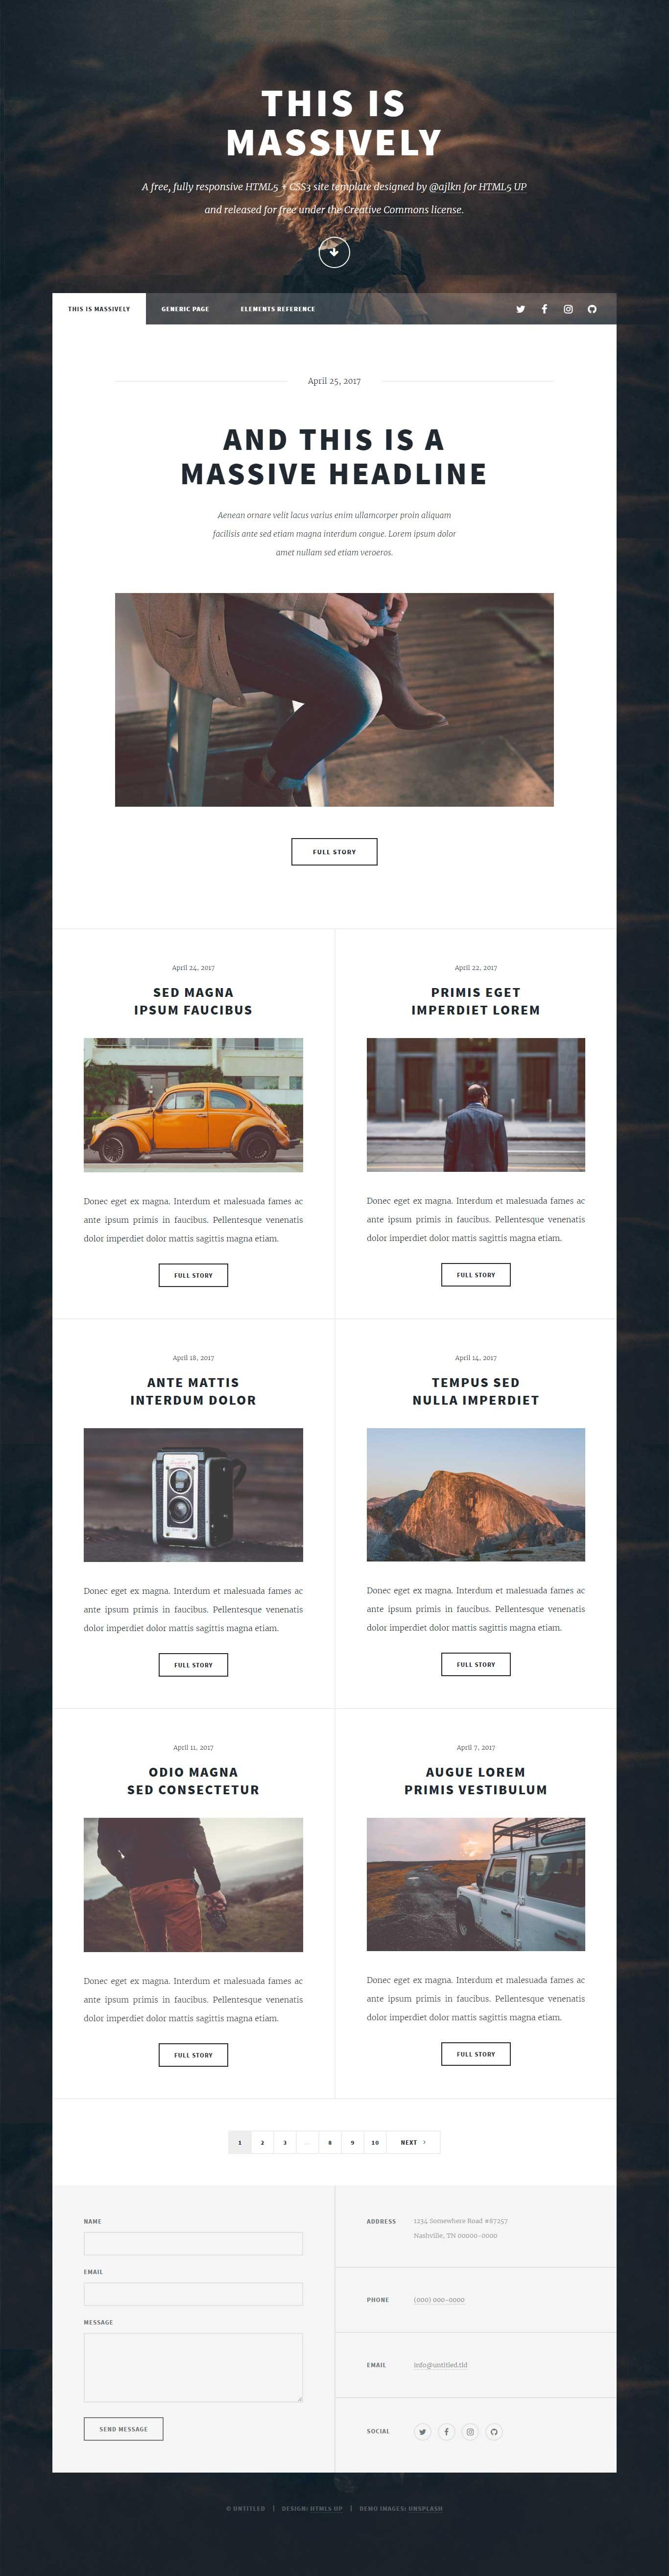 Massively : Fully Responsive HTML5 Template